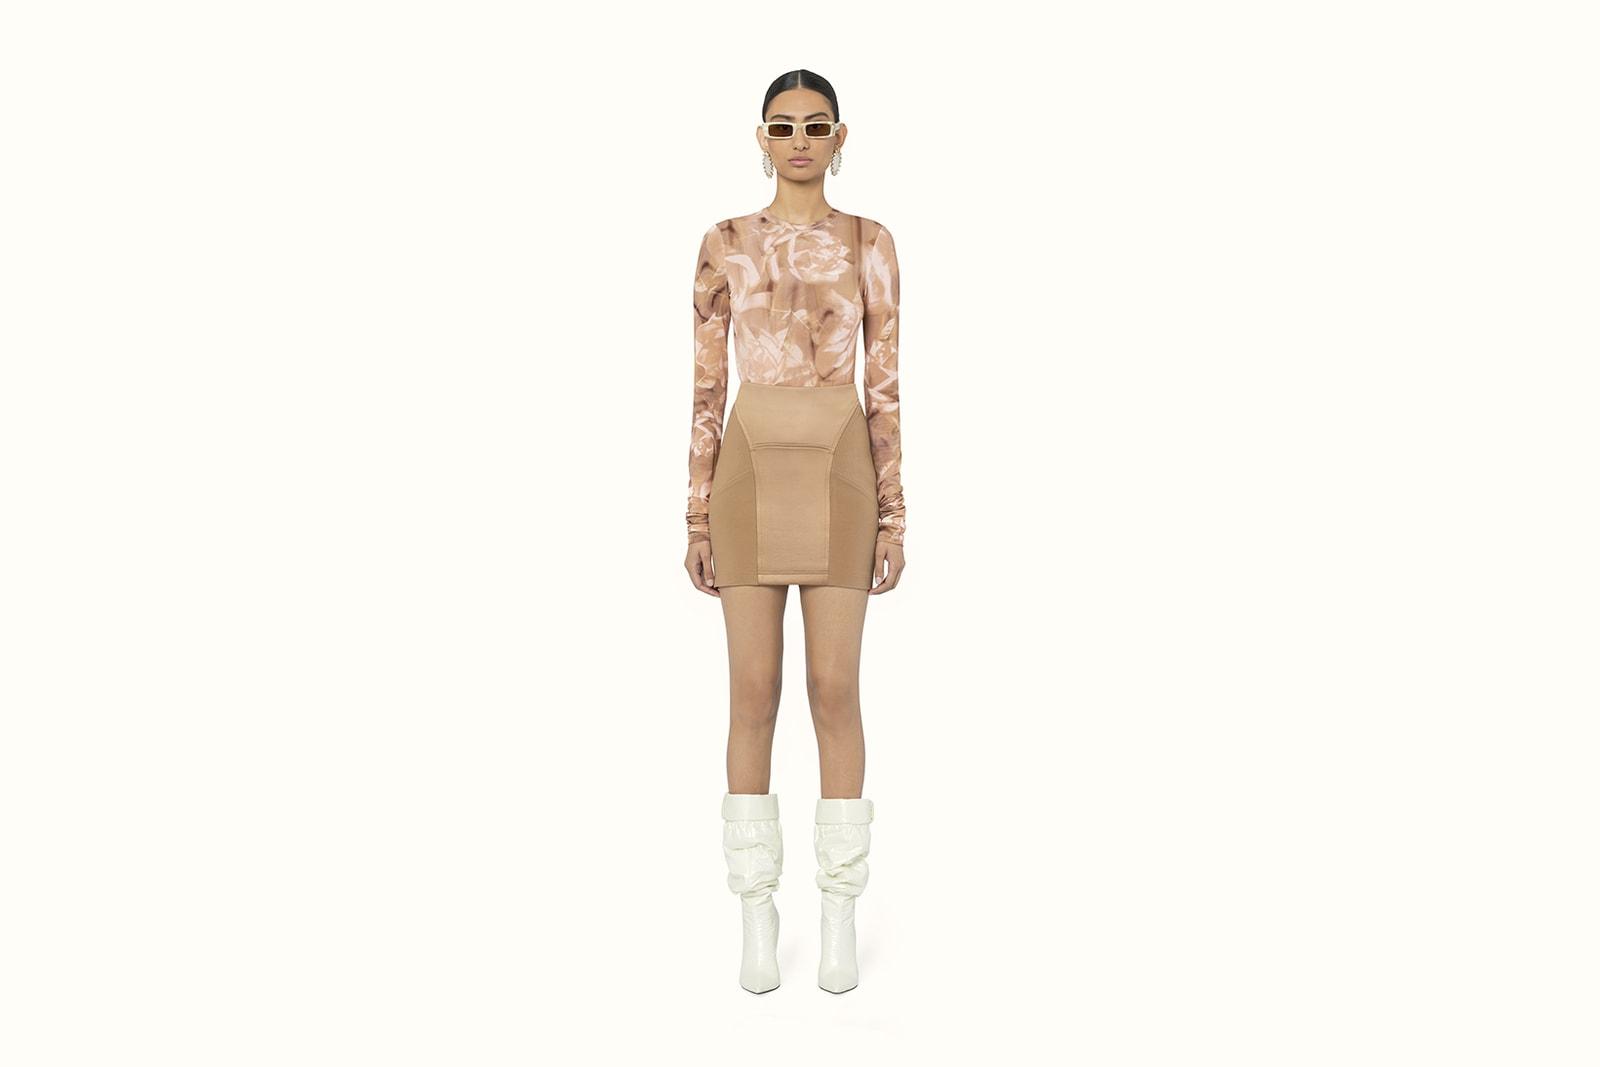 Rihanna FENTY City Bloom Campaign Collection Katsu Naito